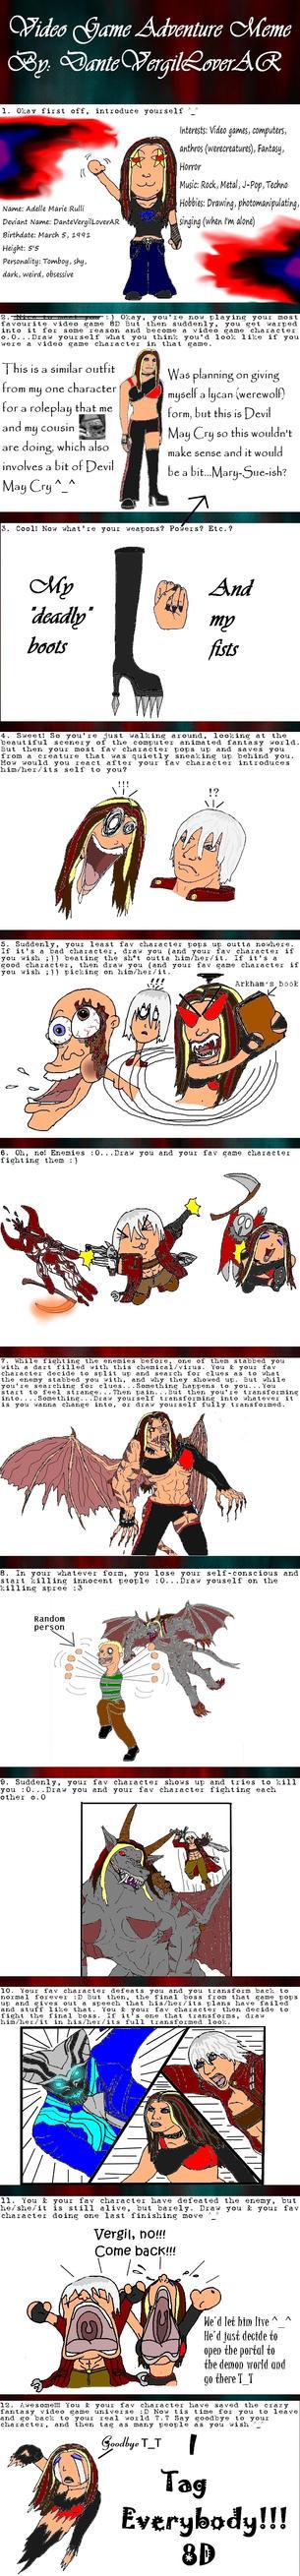 My VG Adventure Meme by DanteVergilLoverAR